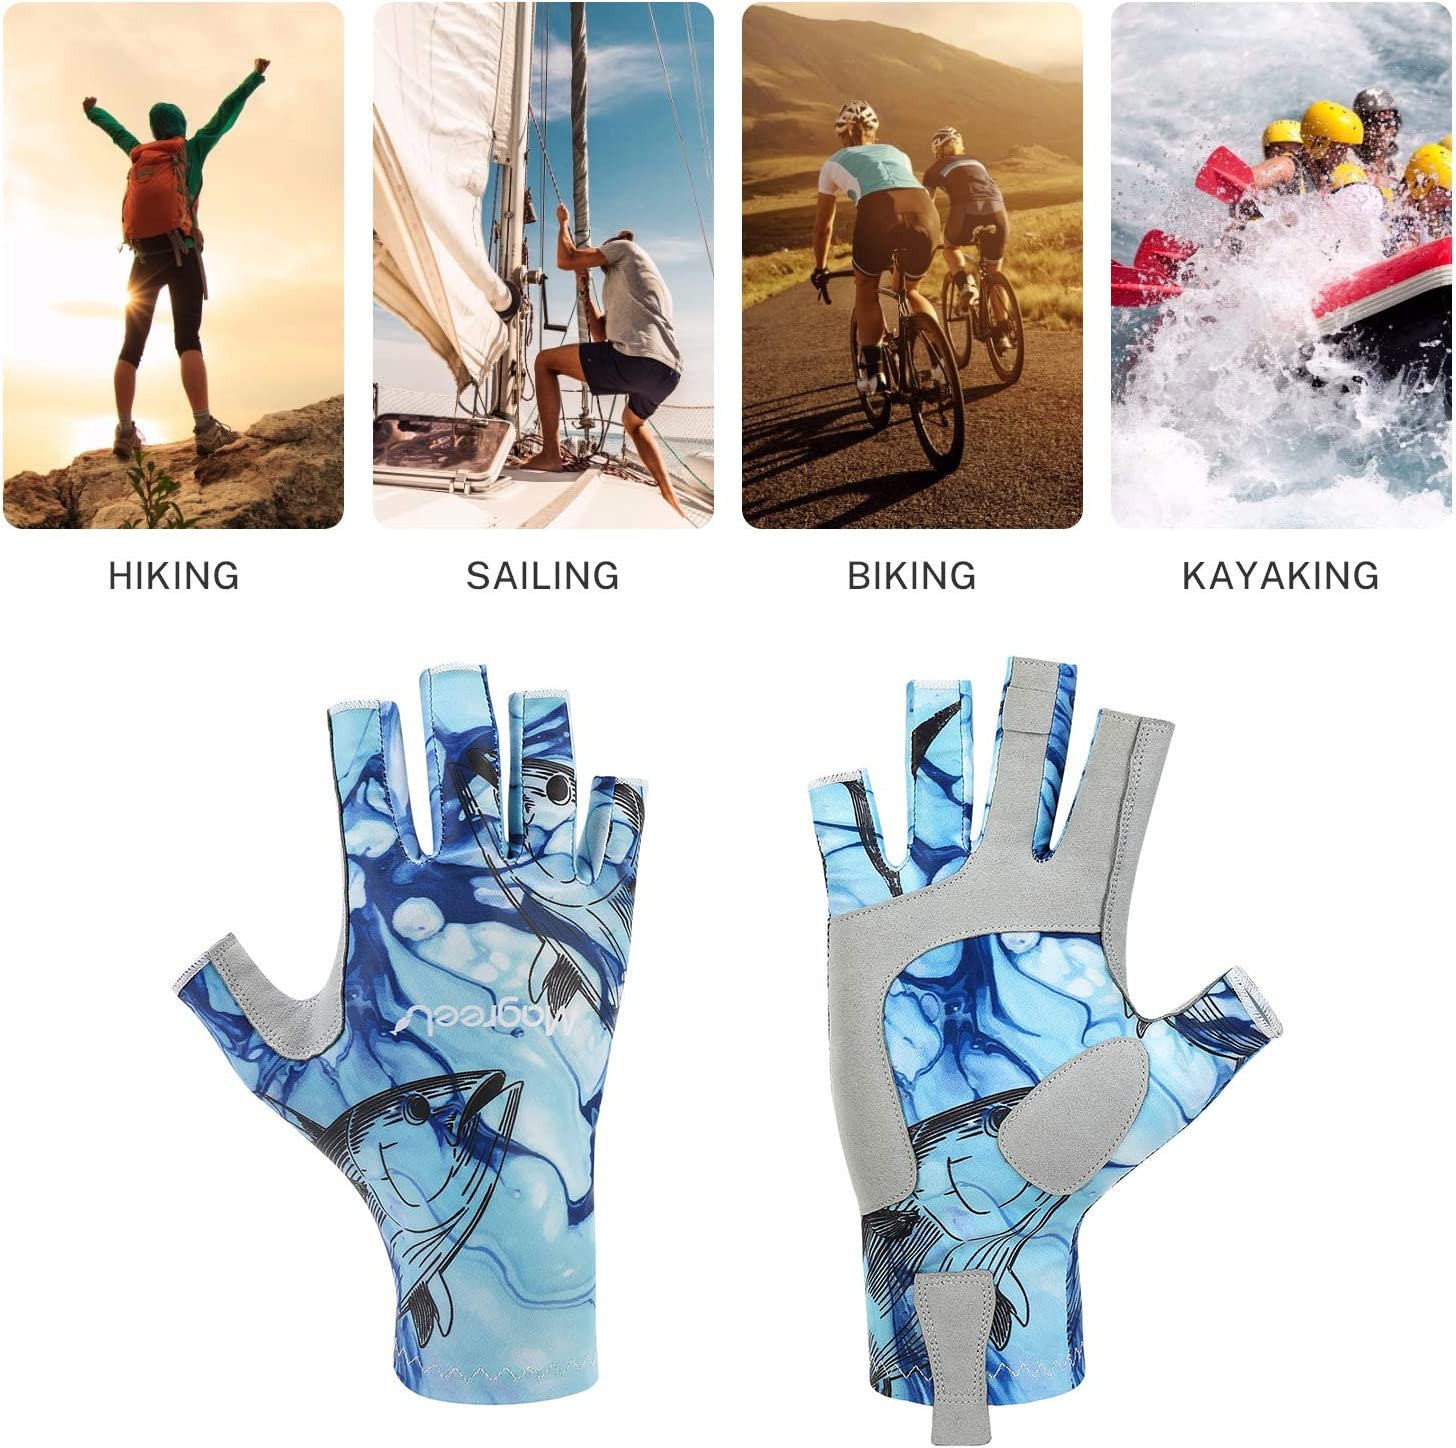 Hiking Padding UPF50+ Sun Protection Fingerless Gloves Breathable Gloves for Sailing Cycling Magreel UV Protection Fishing Gloves for Men Women Surfing Kayaking Boating